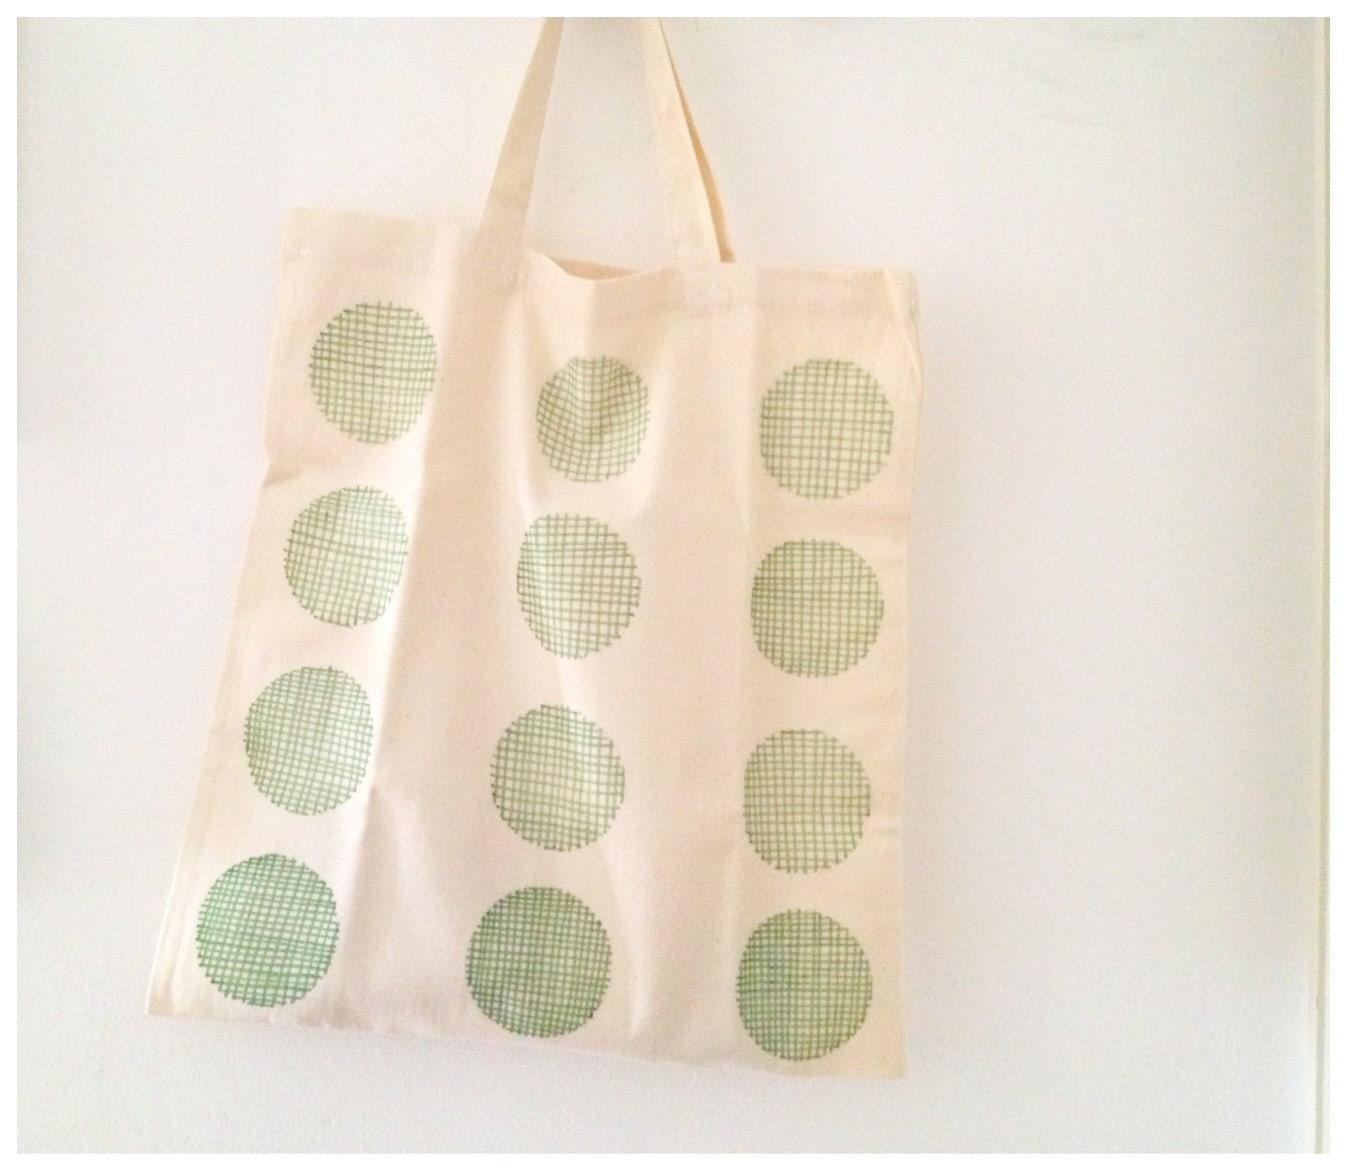 Cotton Tote Bag Green Geometric Tote Polka Dot Bag Eco Design - mipluseddesign